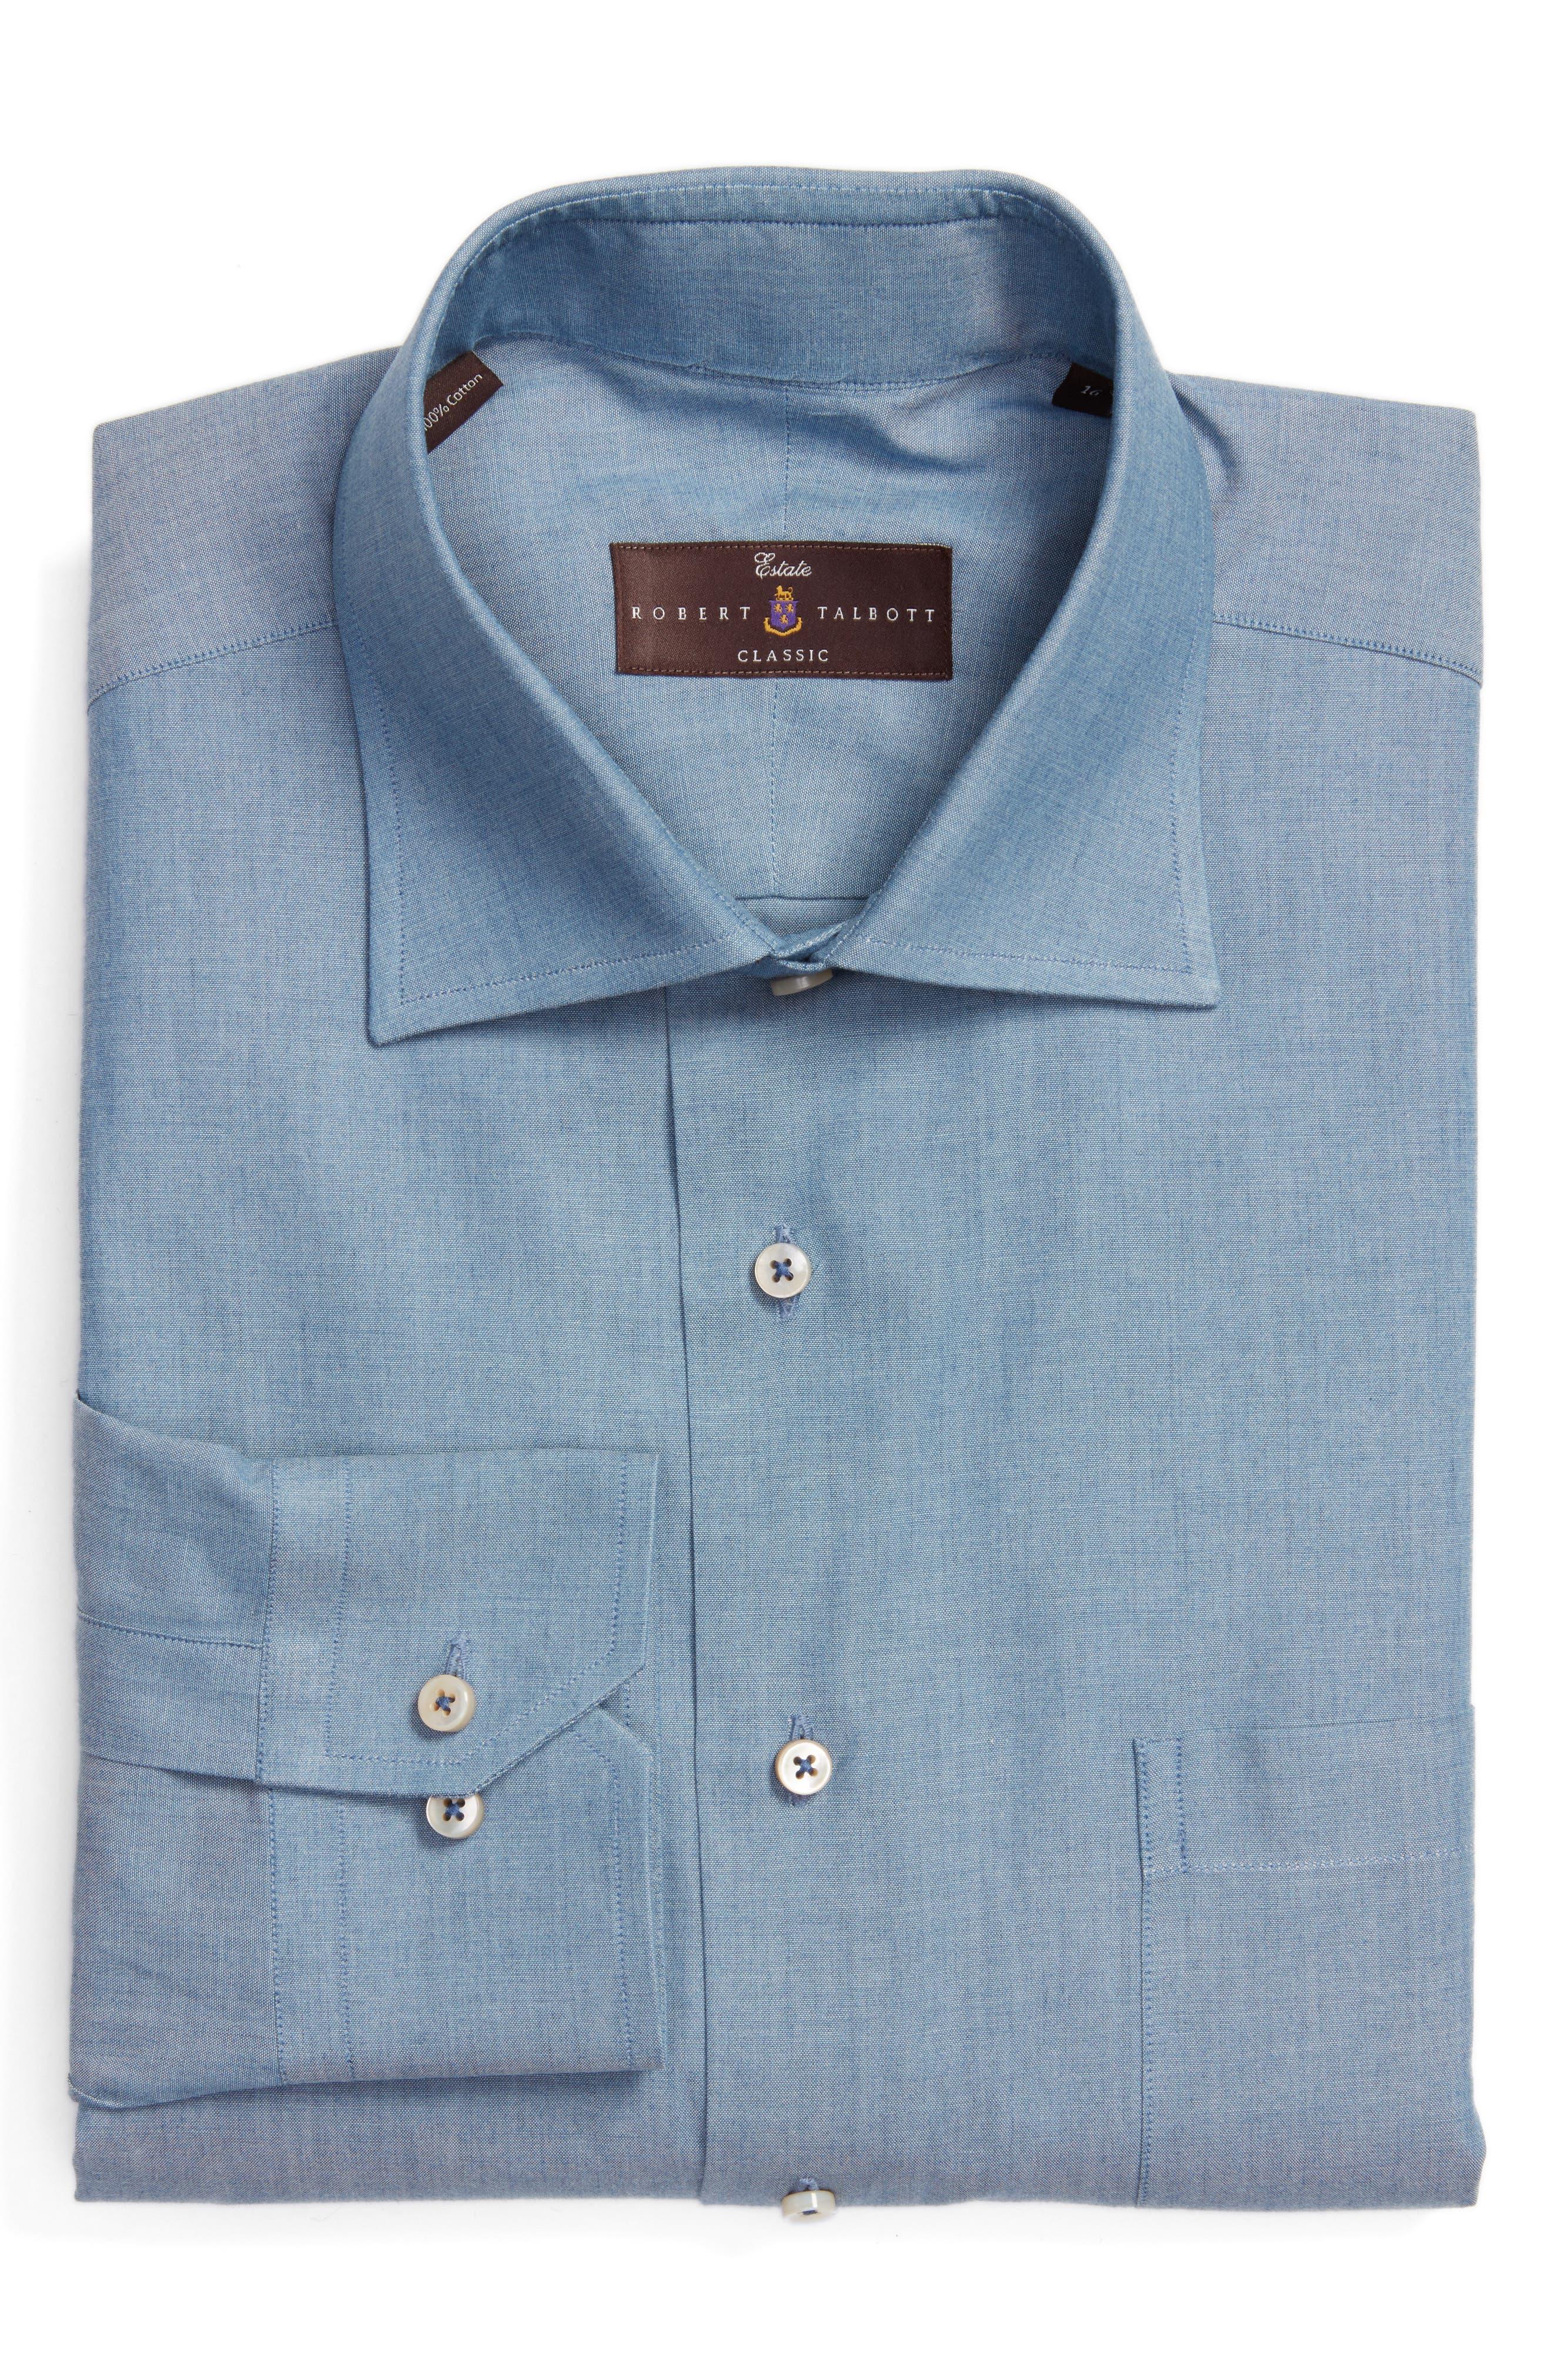 Alternate Image 1 Selected - Robert Talbott Classic Fit Oxford Dress Shirt